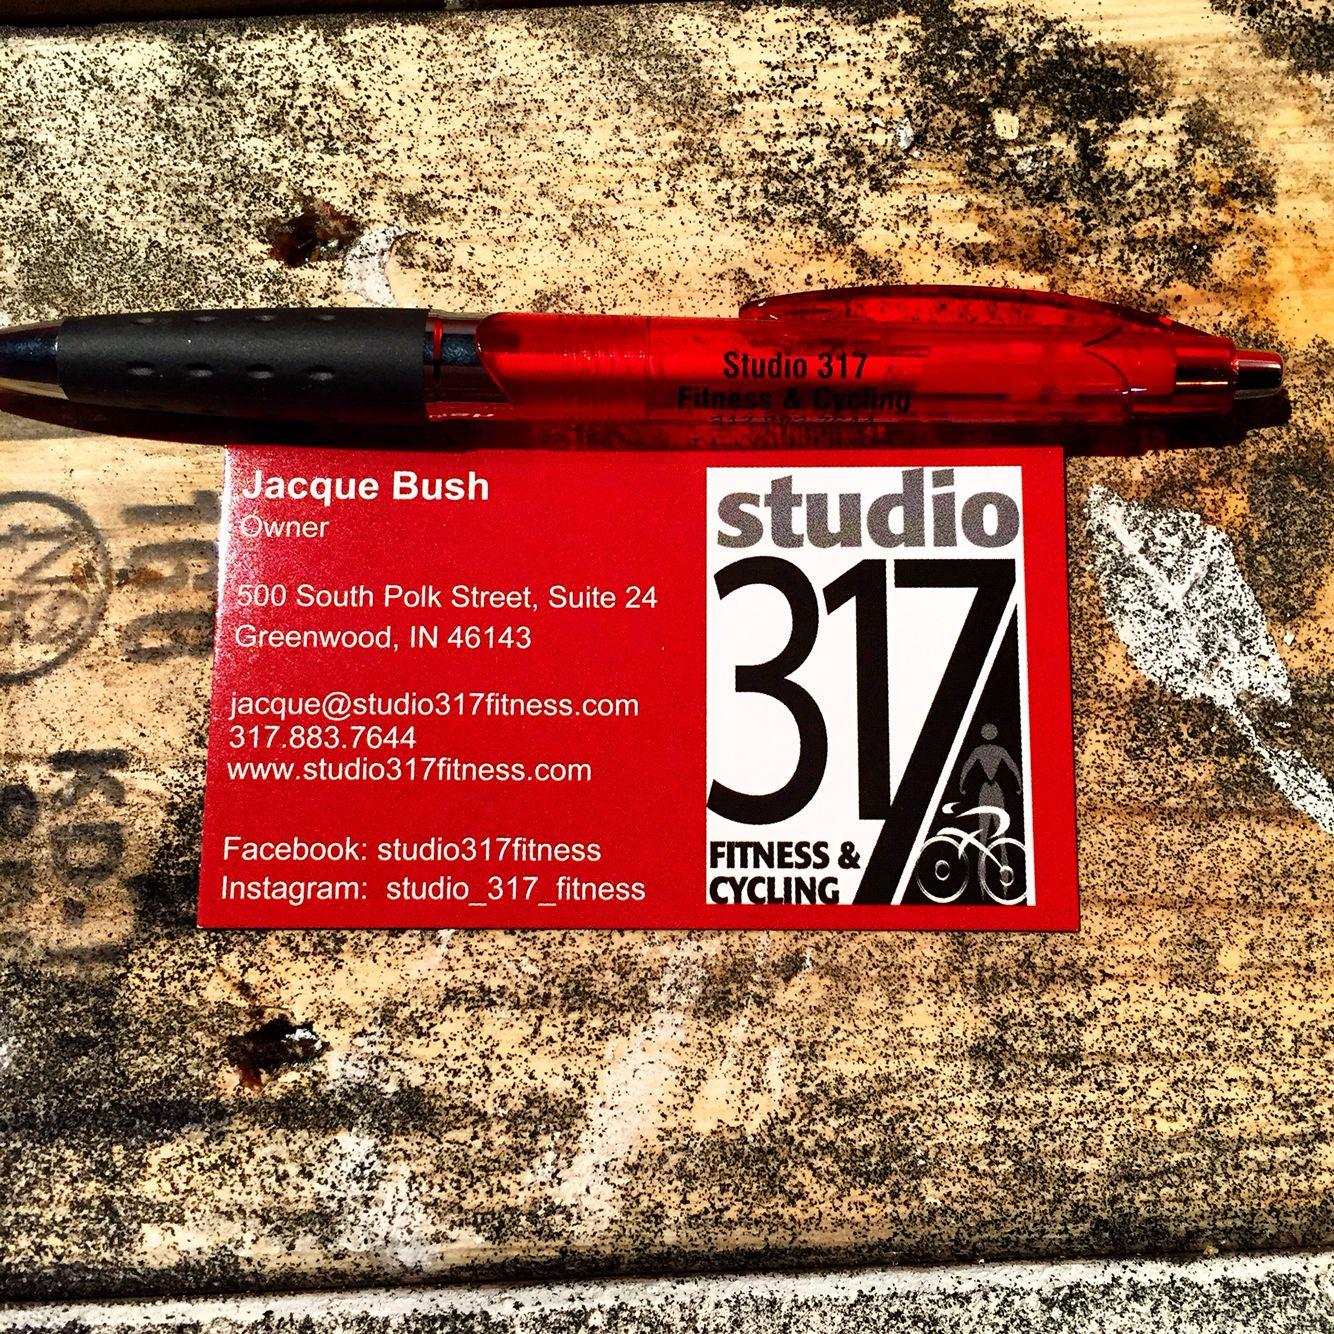 Studio 317 Fitness & Cycling